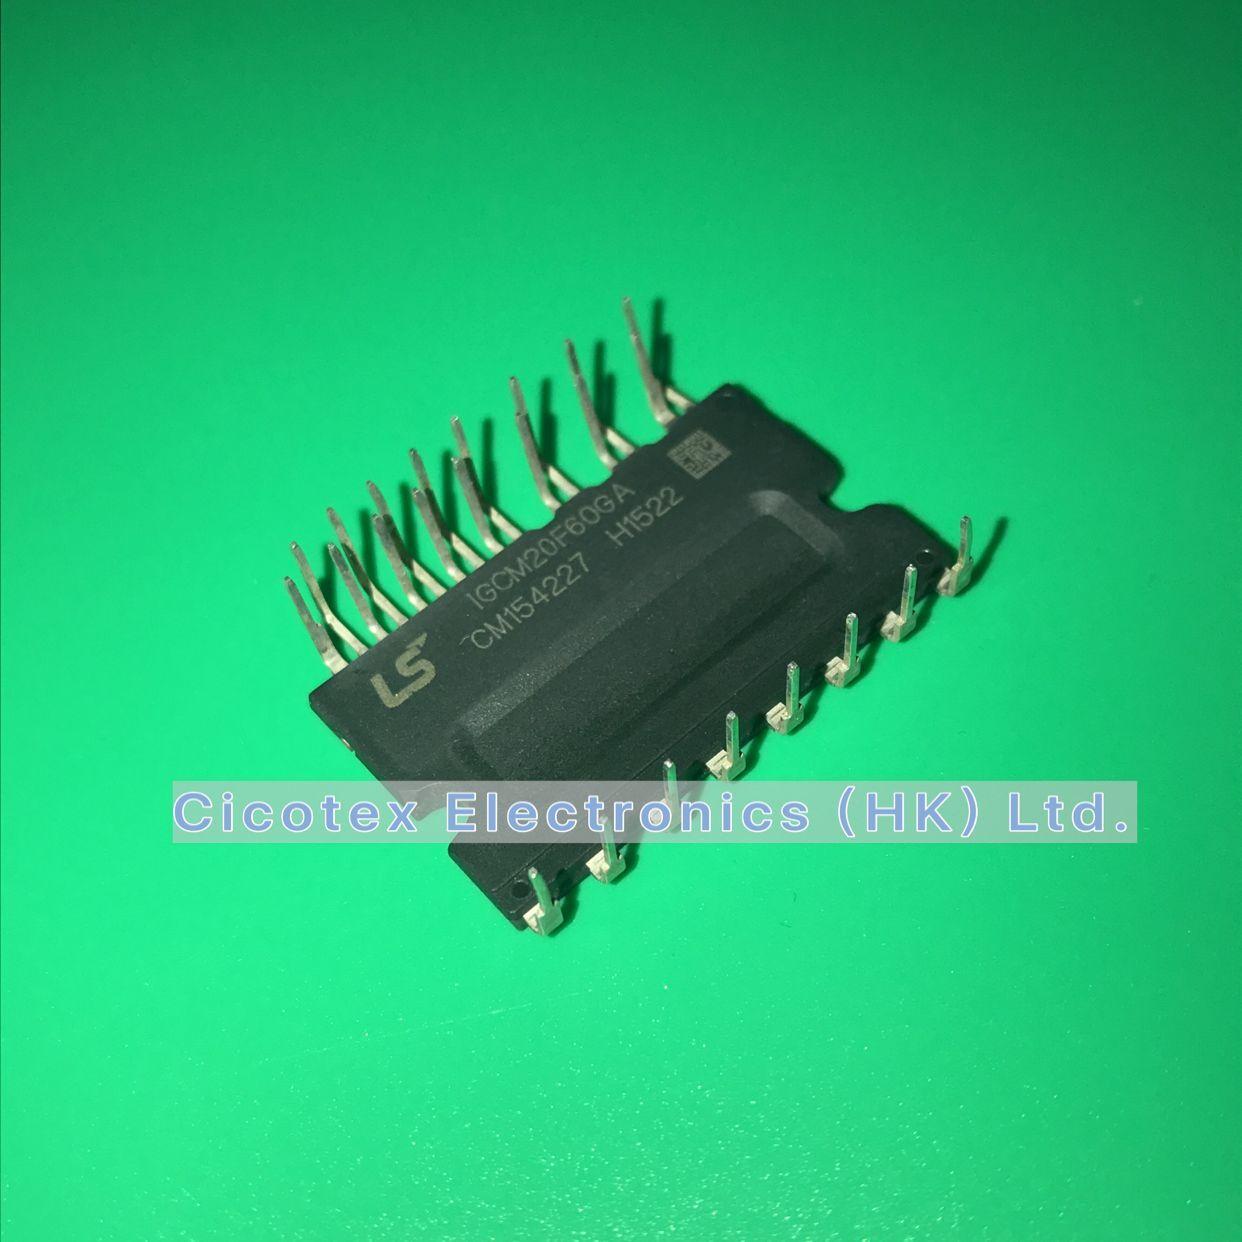 IGCM20F60GA Module IGCM 20F60GA IGBT Power Driver Module IGBT 3 Phase 600V 20A 24-PowerDIP Module (1.028